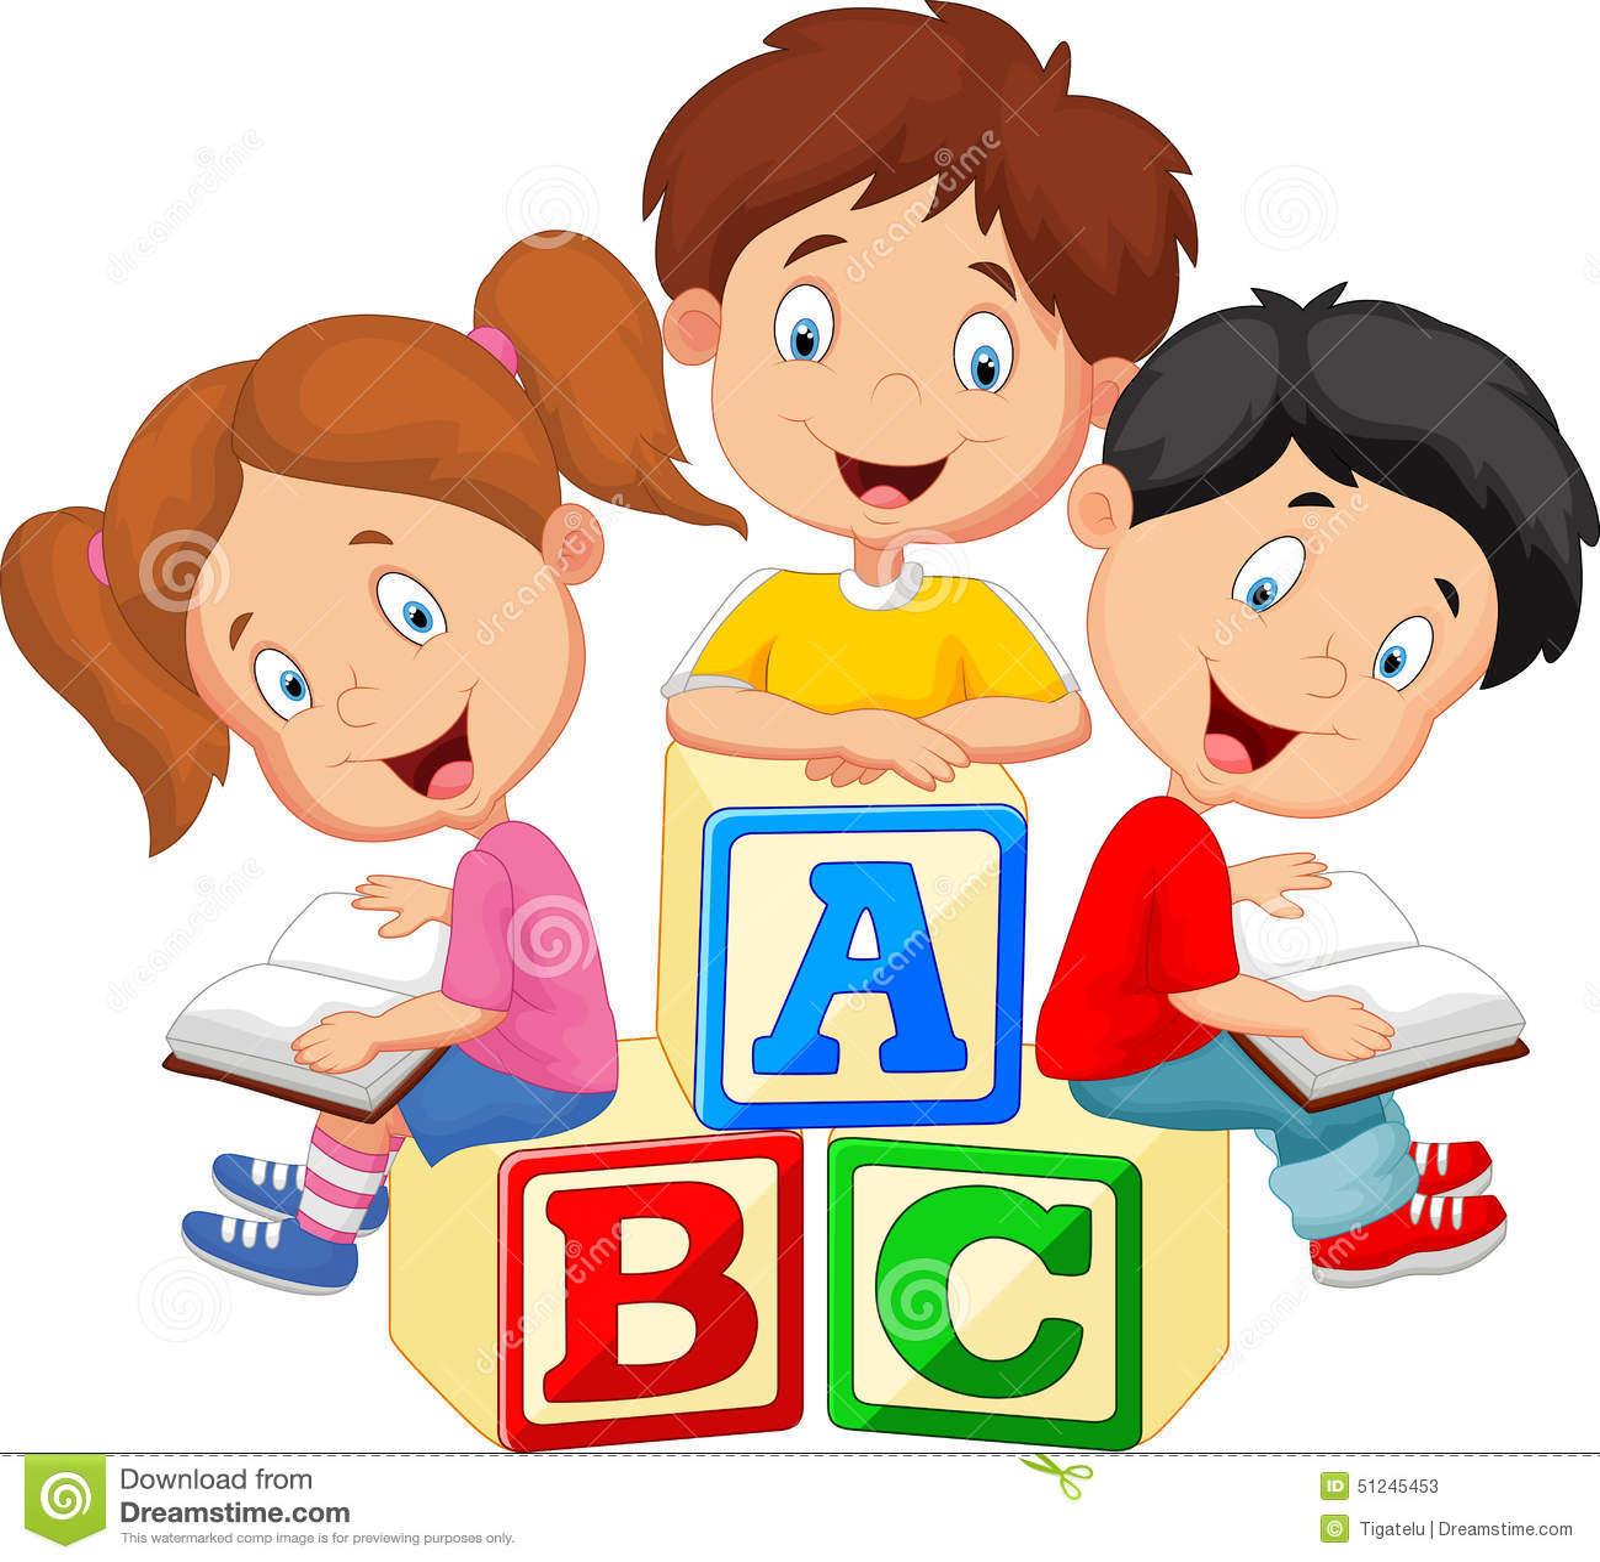 children cartoon reading book and sitting on alphabet blocks stock vector - Cartoon Children Images